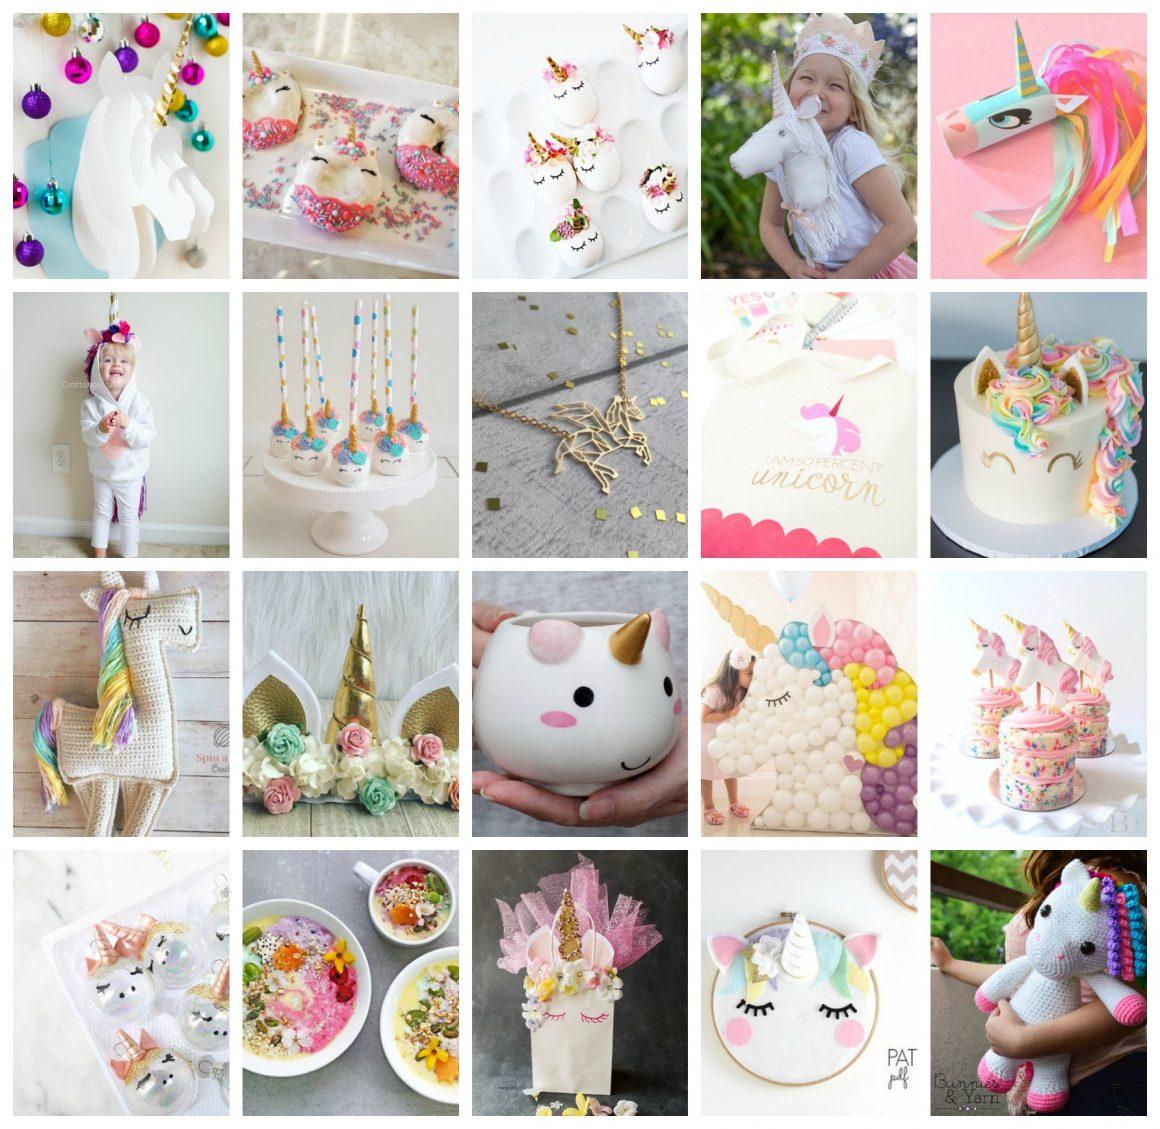 75+ Magically Inspiring Unicorn Crafts, DIYs, Foods And